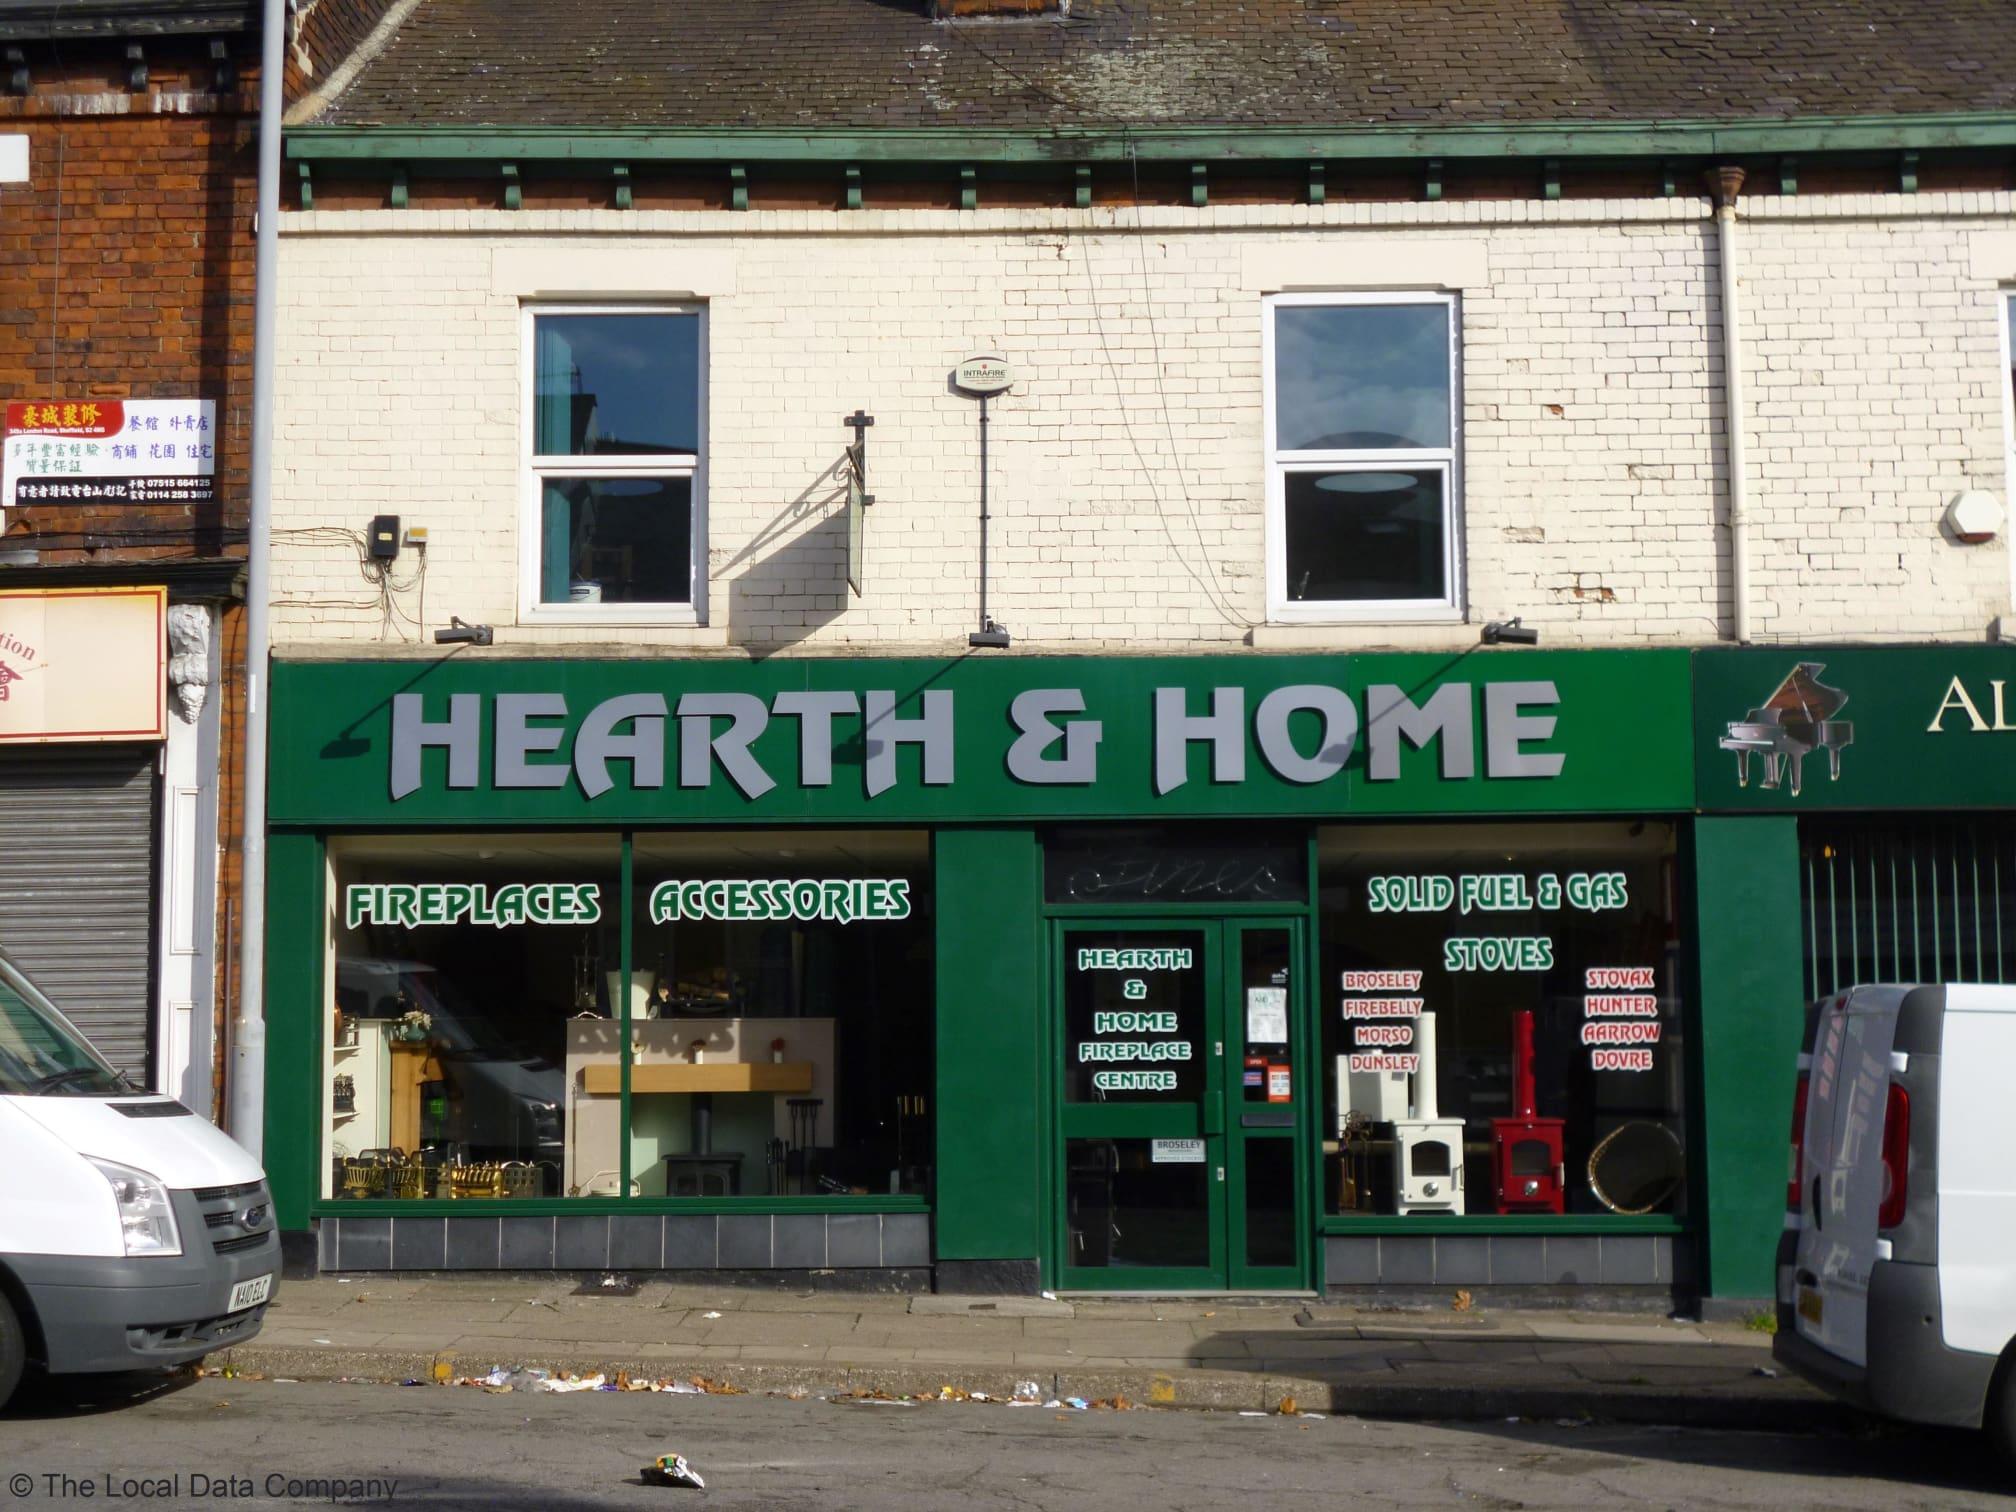 Hearth & Home Ltd